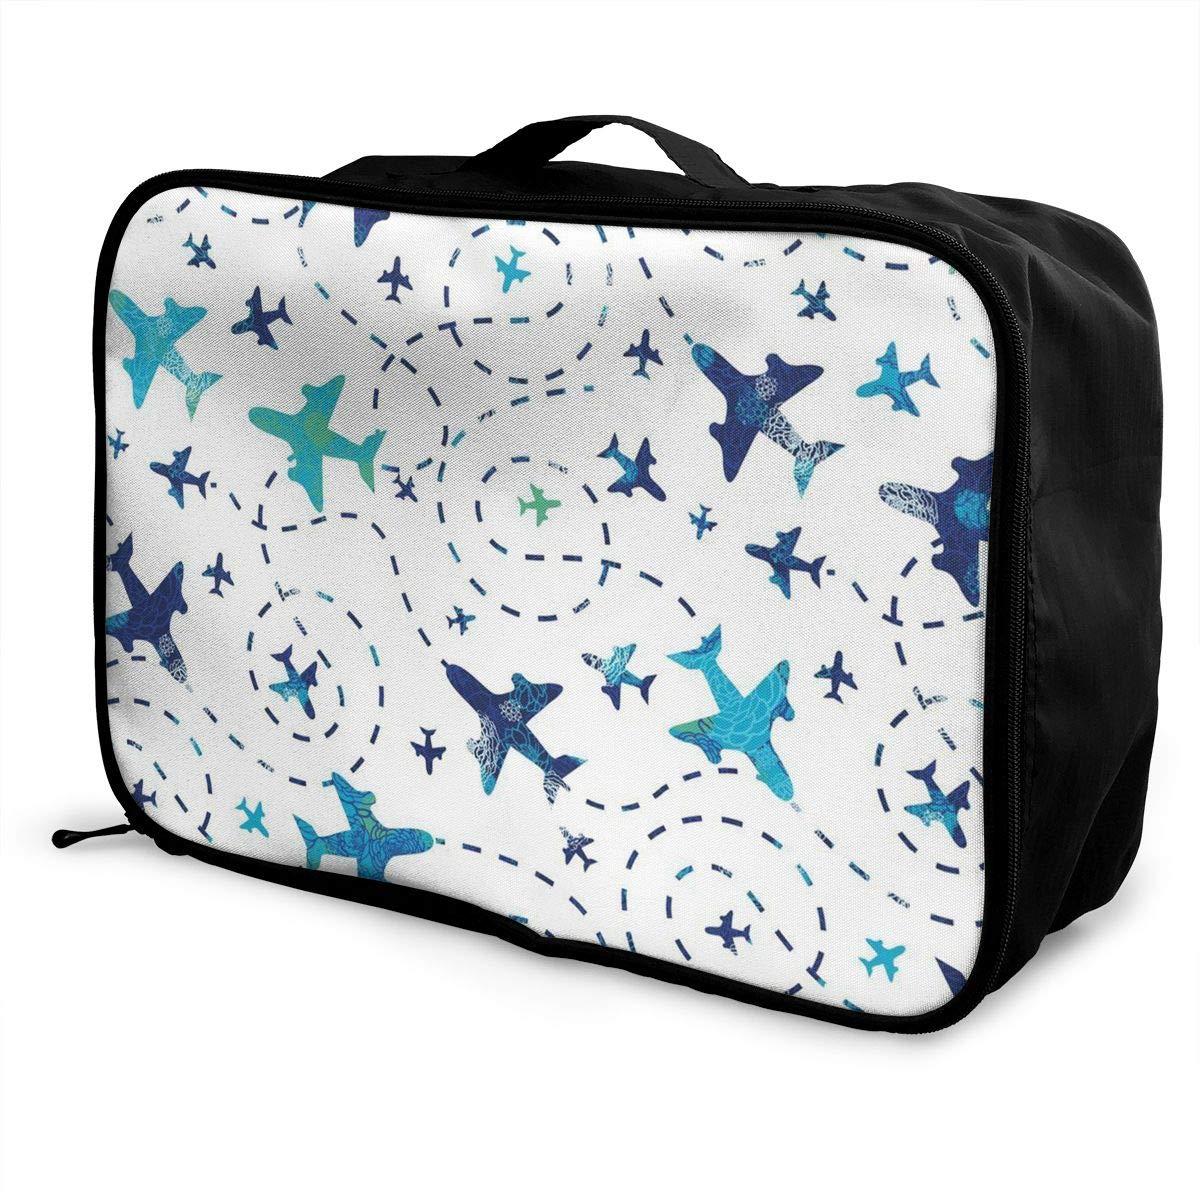 Travel Luggage Duffle Bag Lightweight Portable Handbag Mothers Day Large Capacity Waterproof Foldable Storage Tote